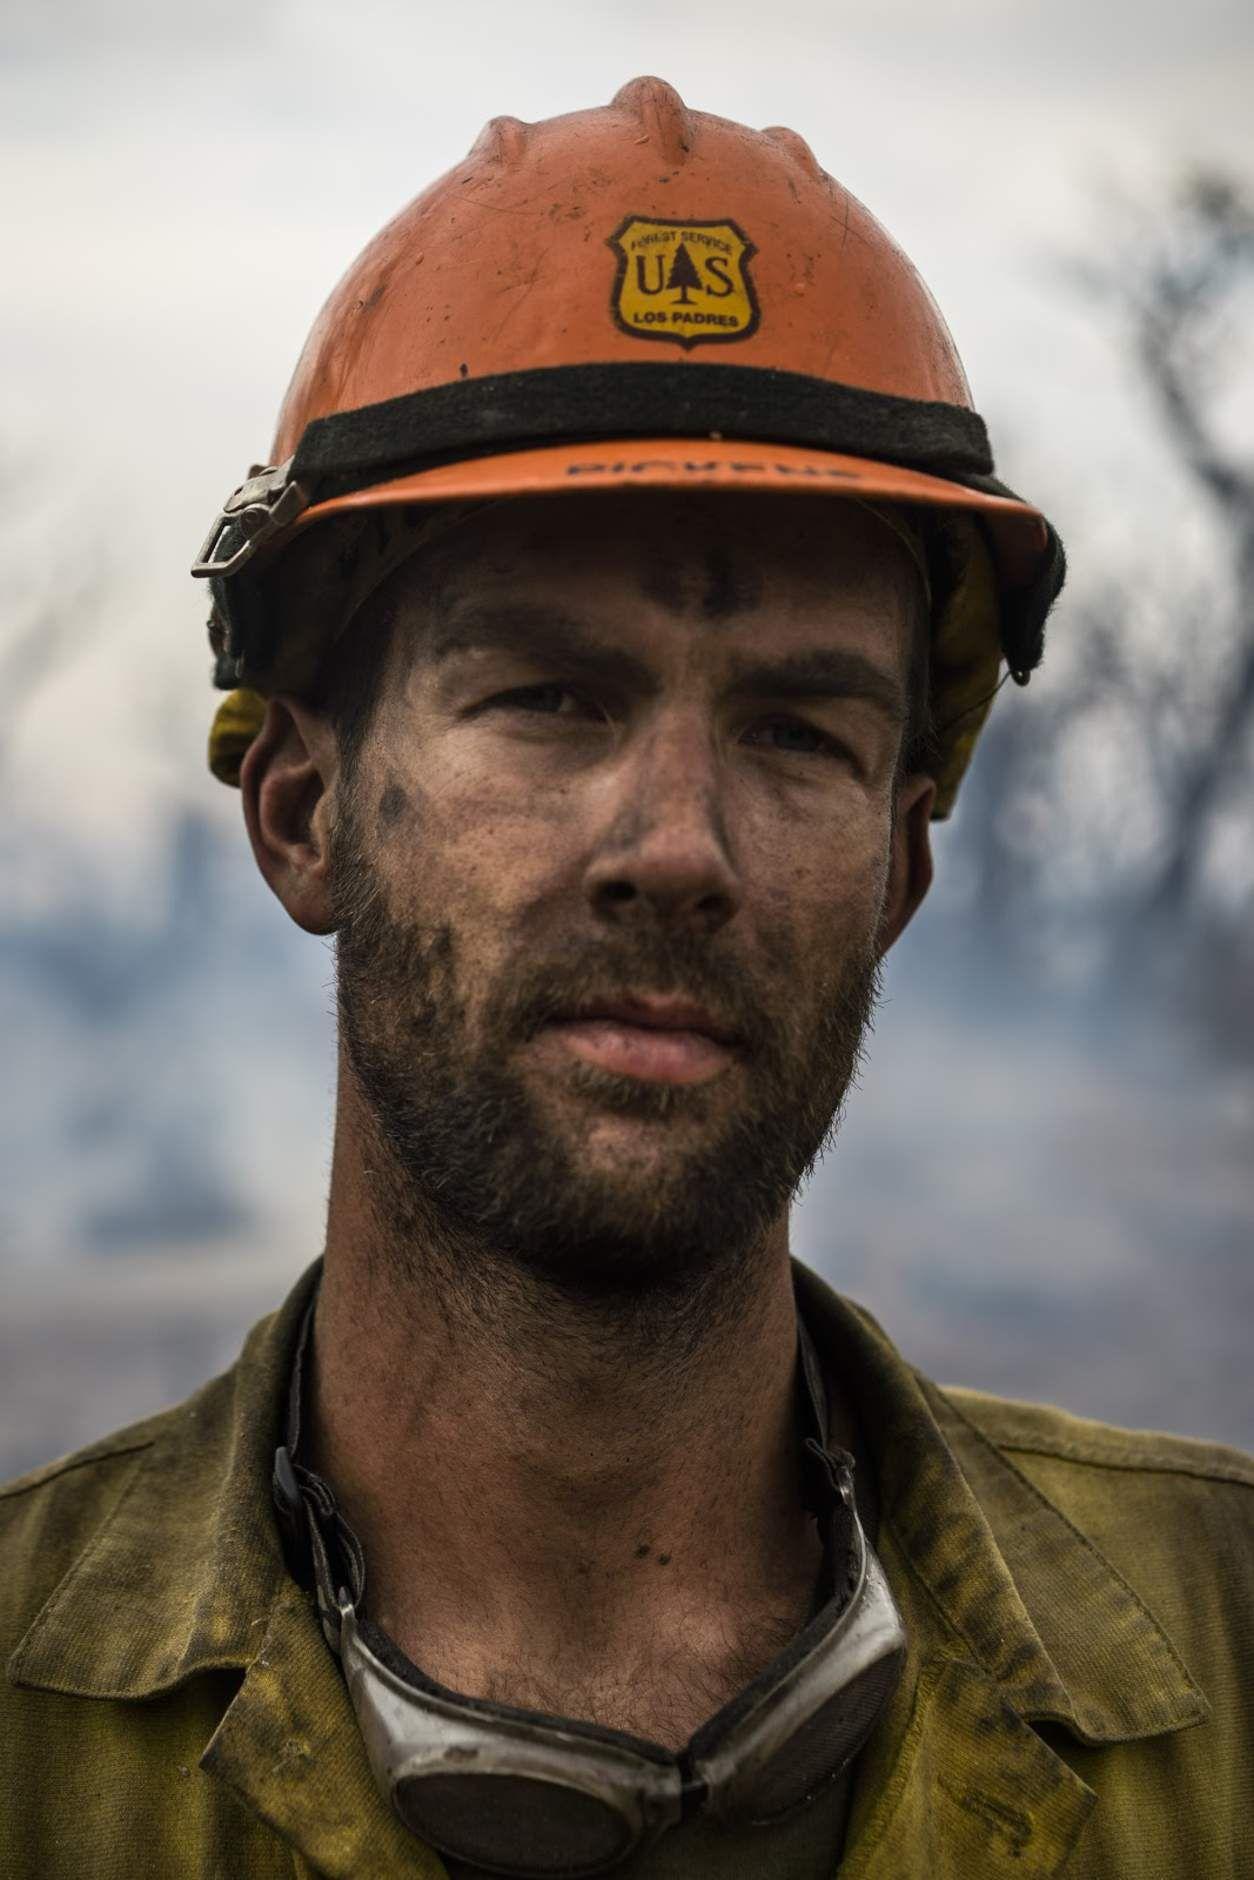 A reallife romance novel hero firefighter Justin Pickens